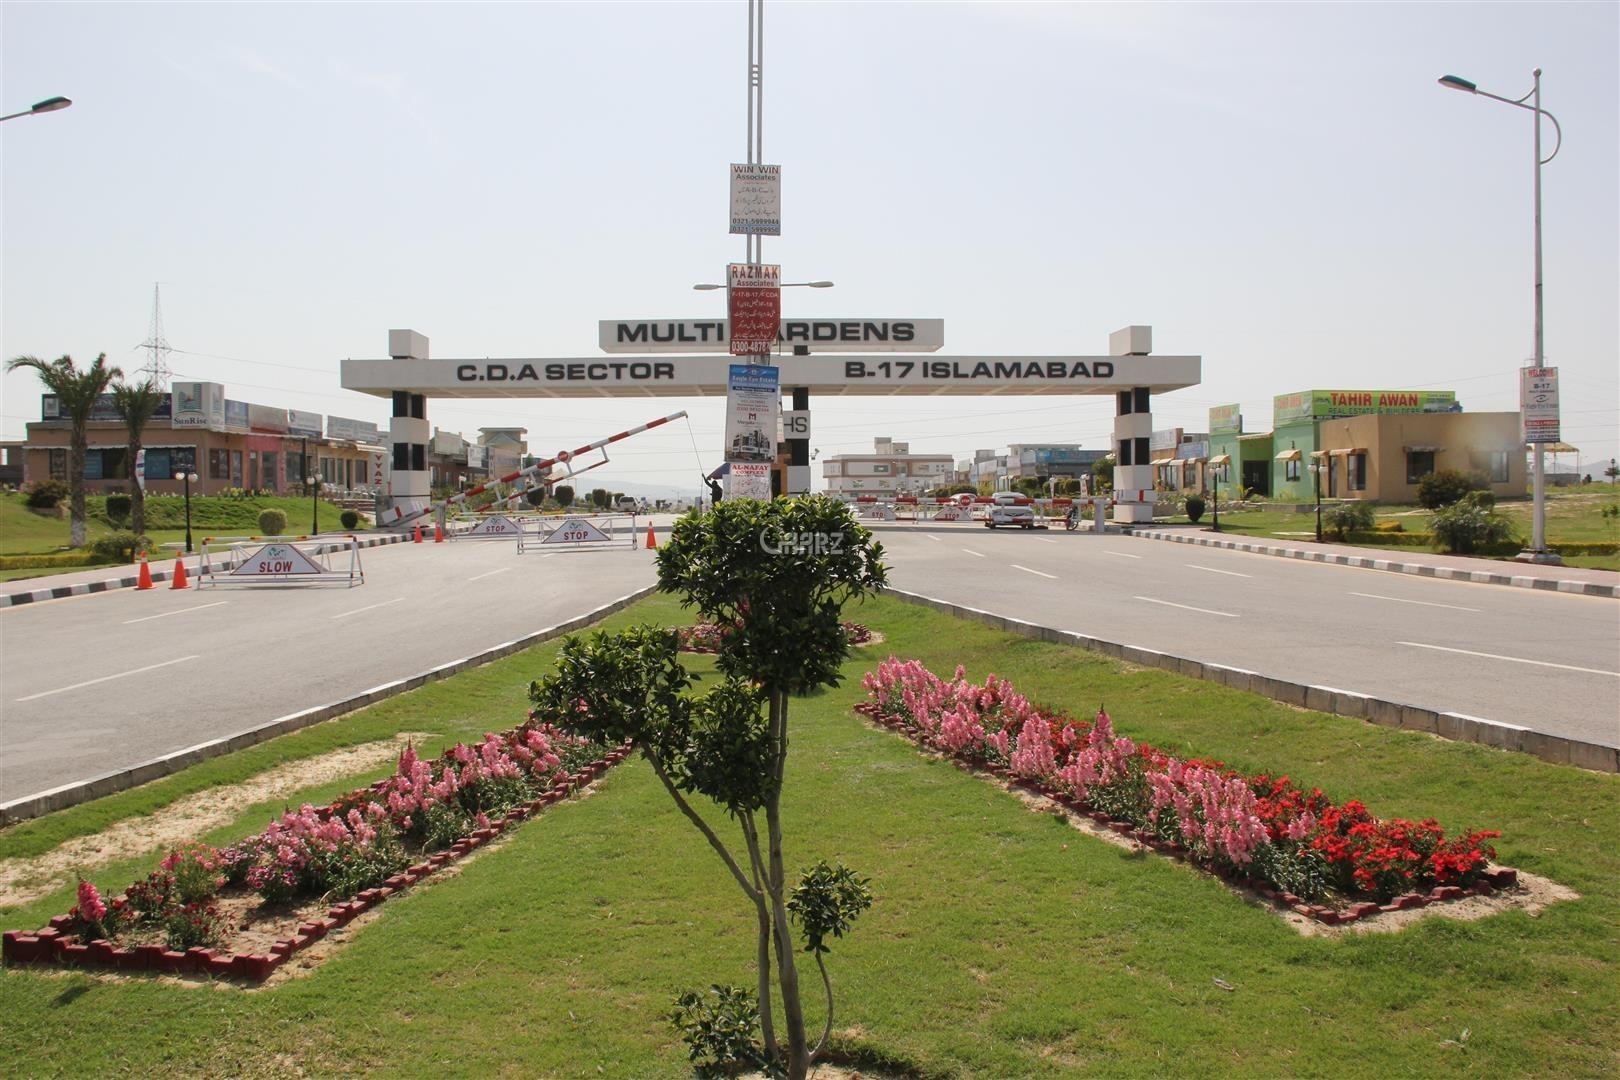 14 Marla Plot in B-17 Block-B, Islamabad is for Sale